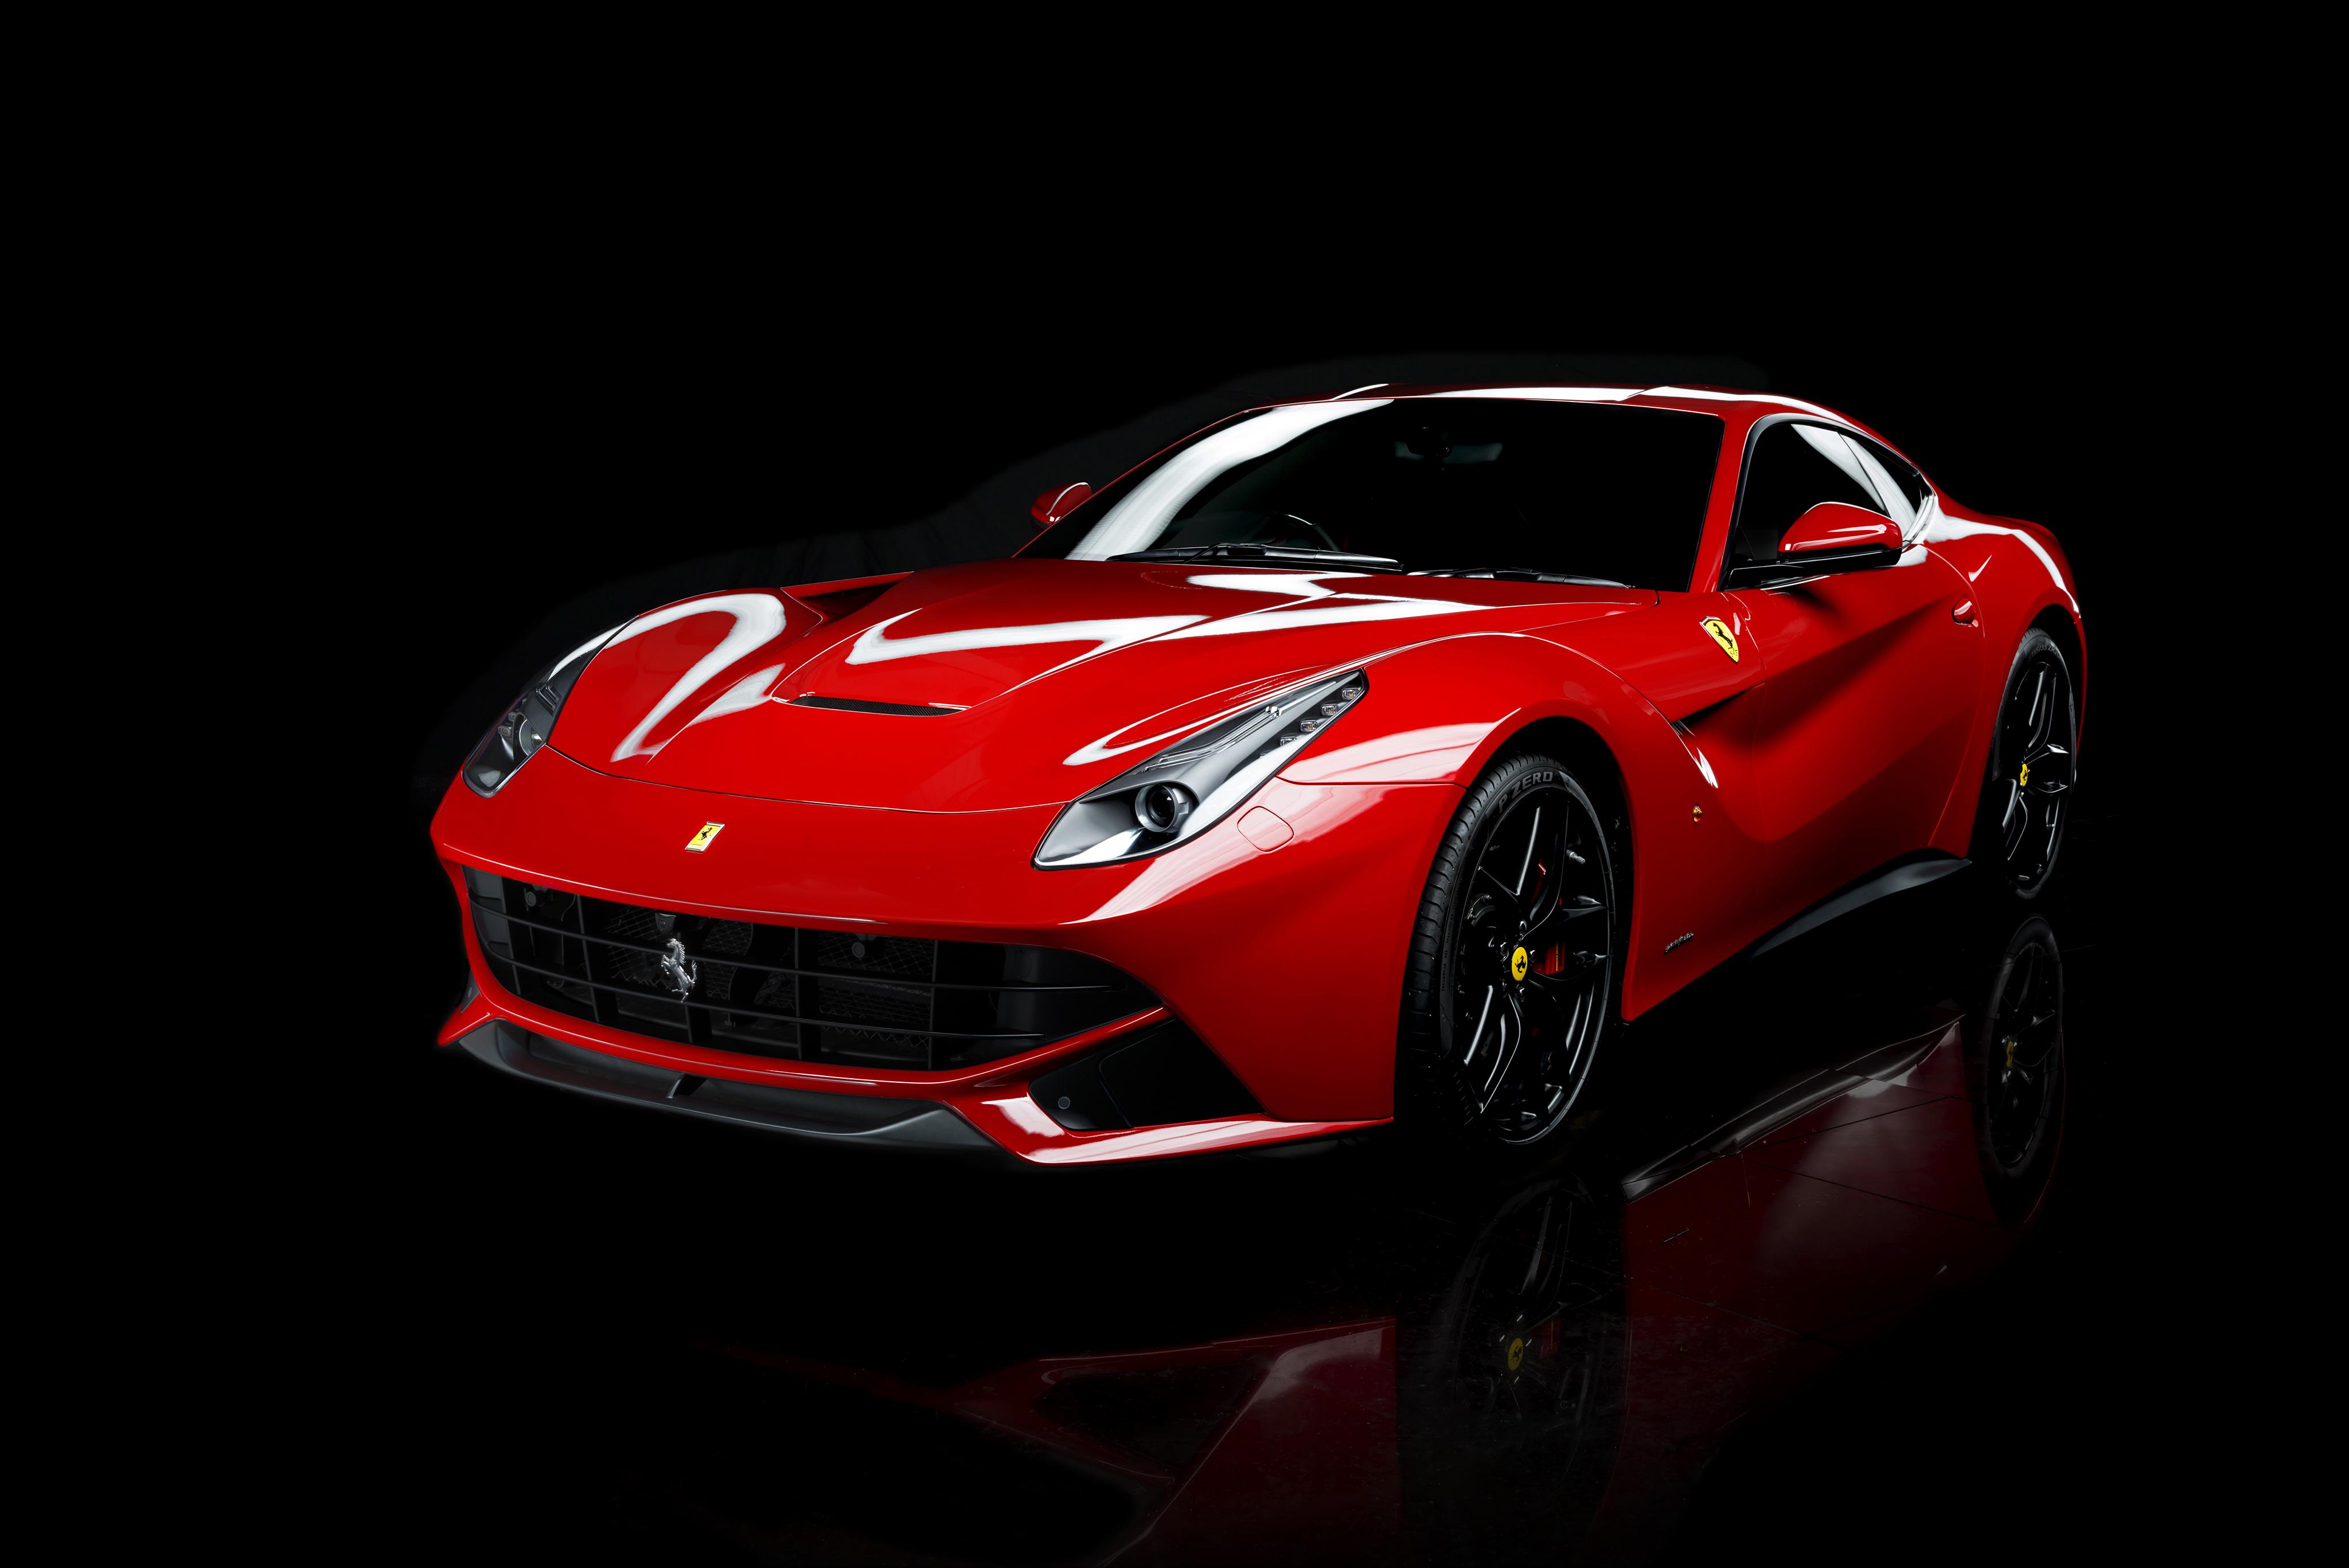 Ferrari F12 дорога забор без смс